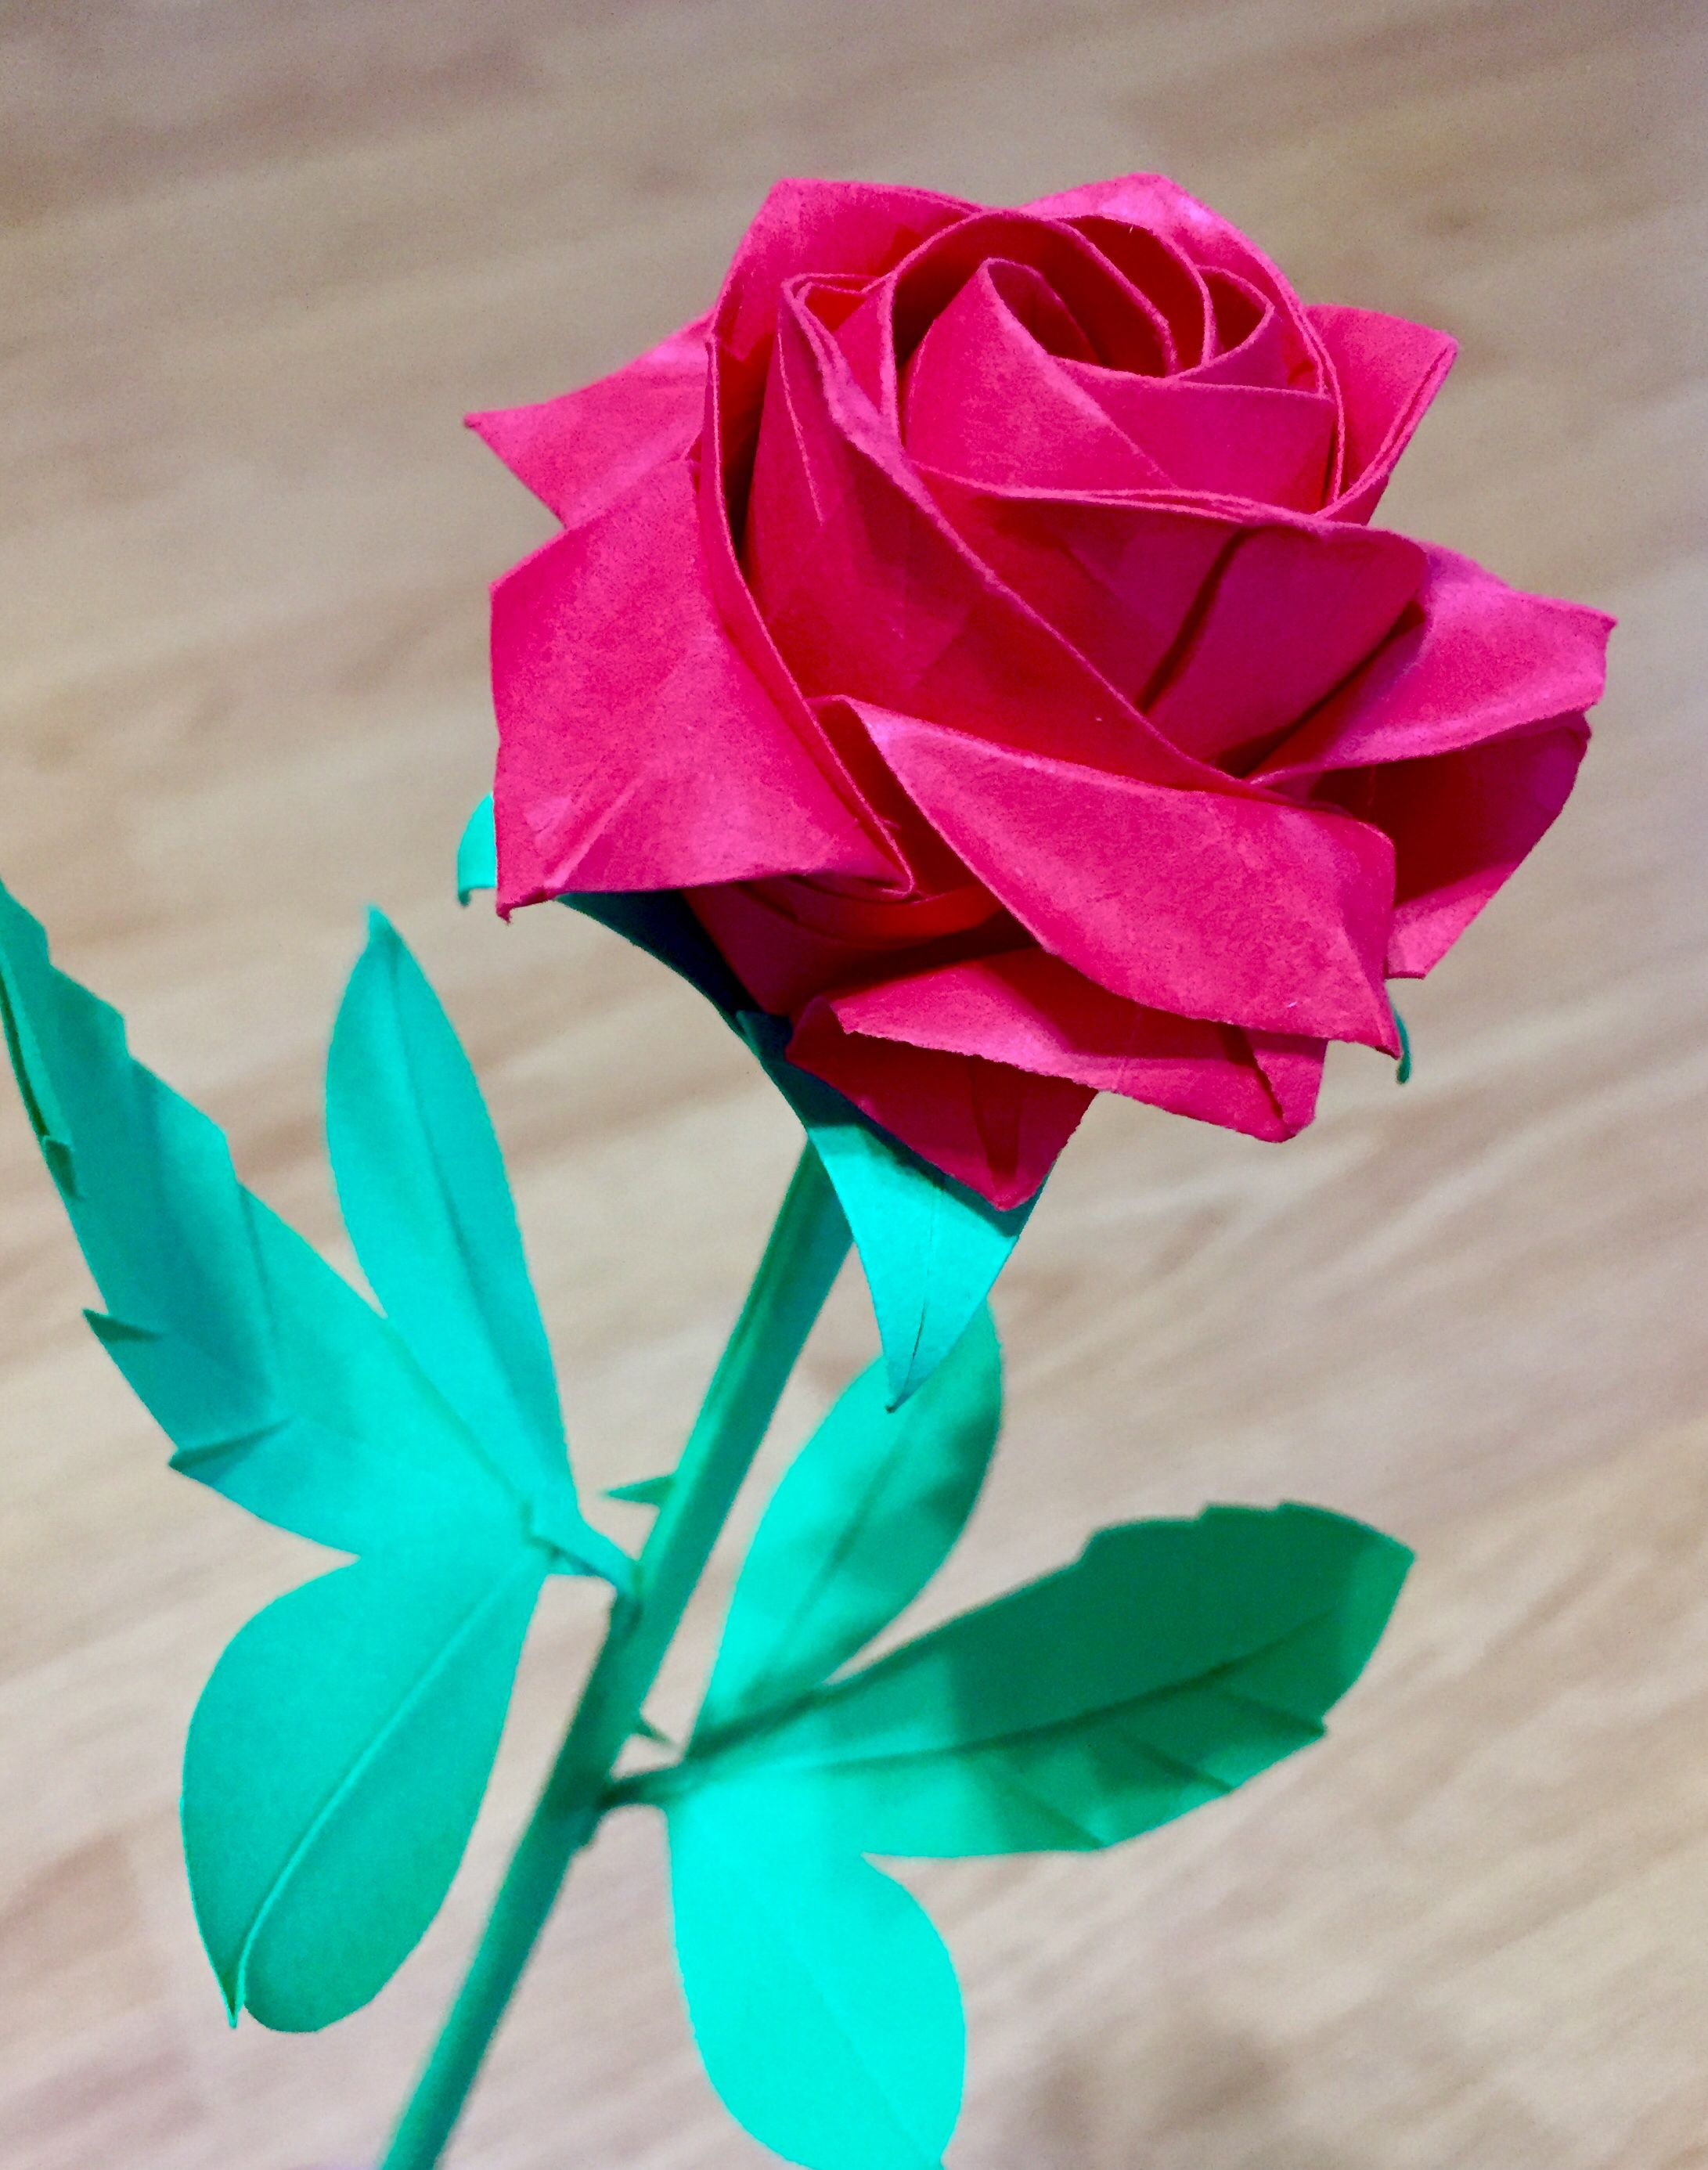 Amazing Origami Pentagon Rose Paper Flowers Paper Roses Easy Origami Flower